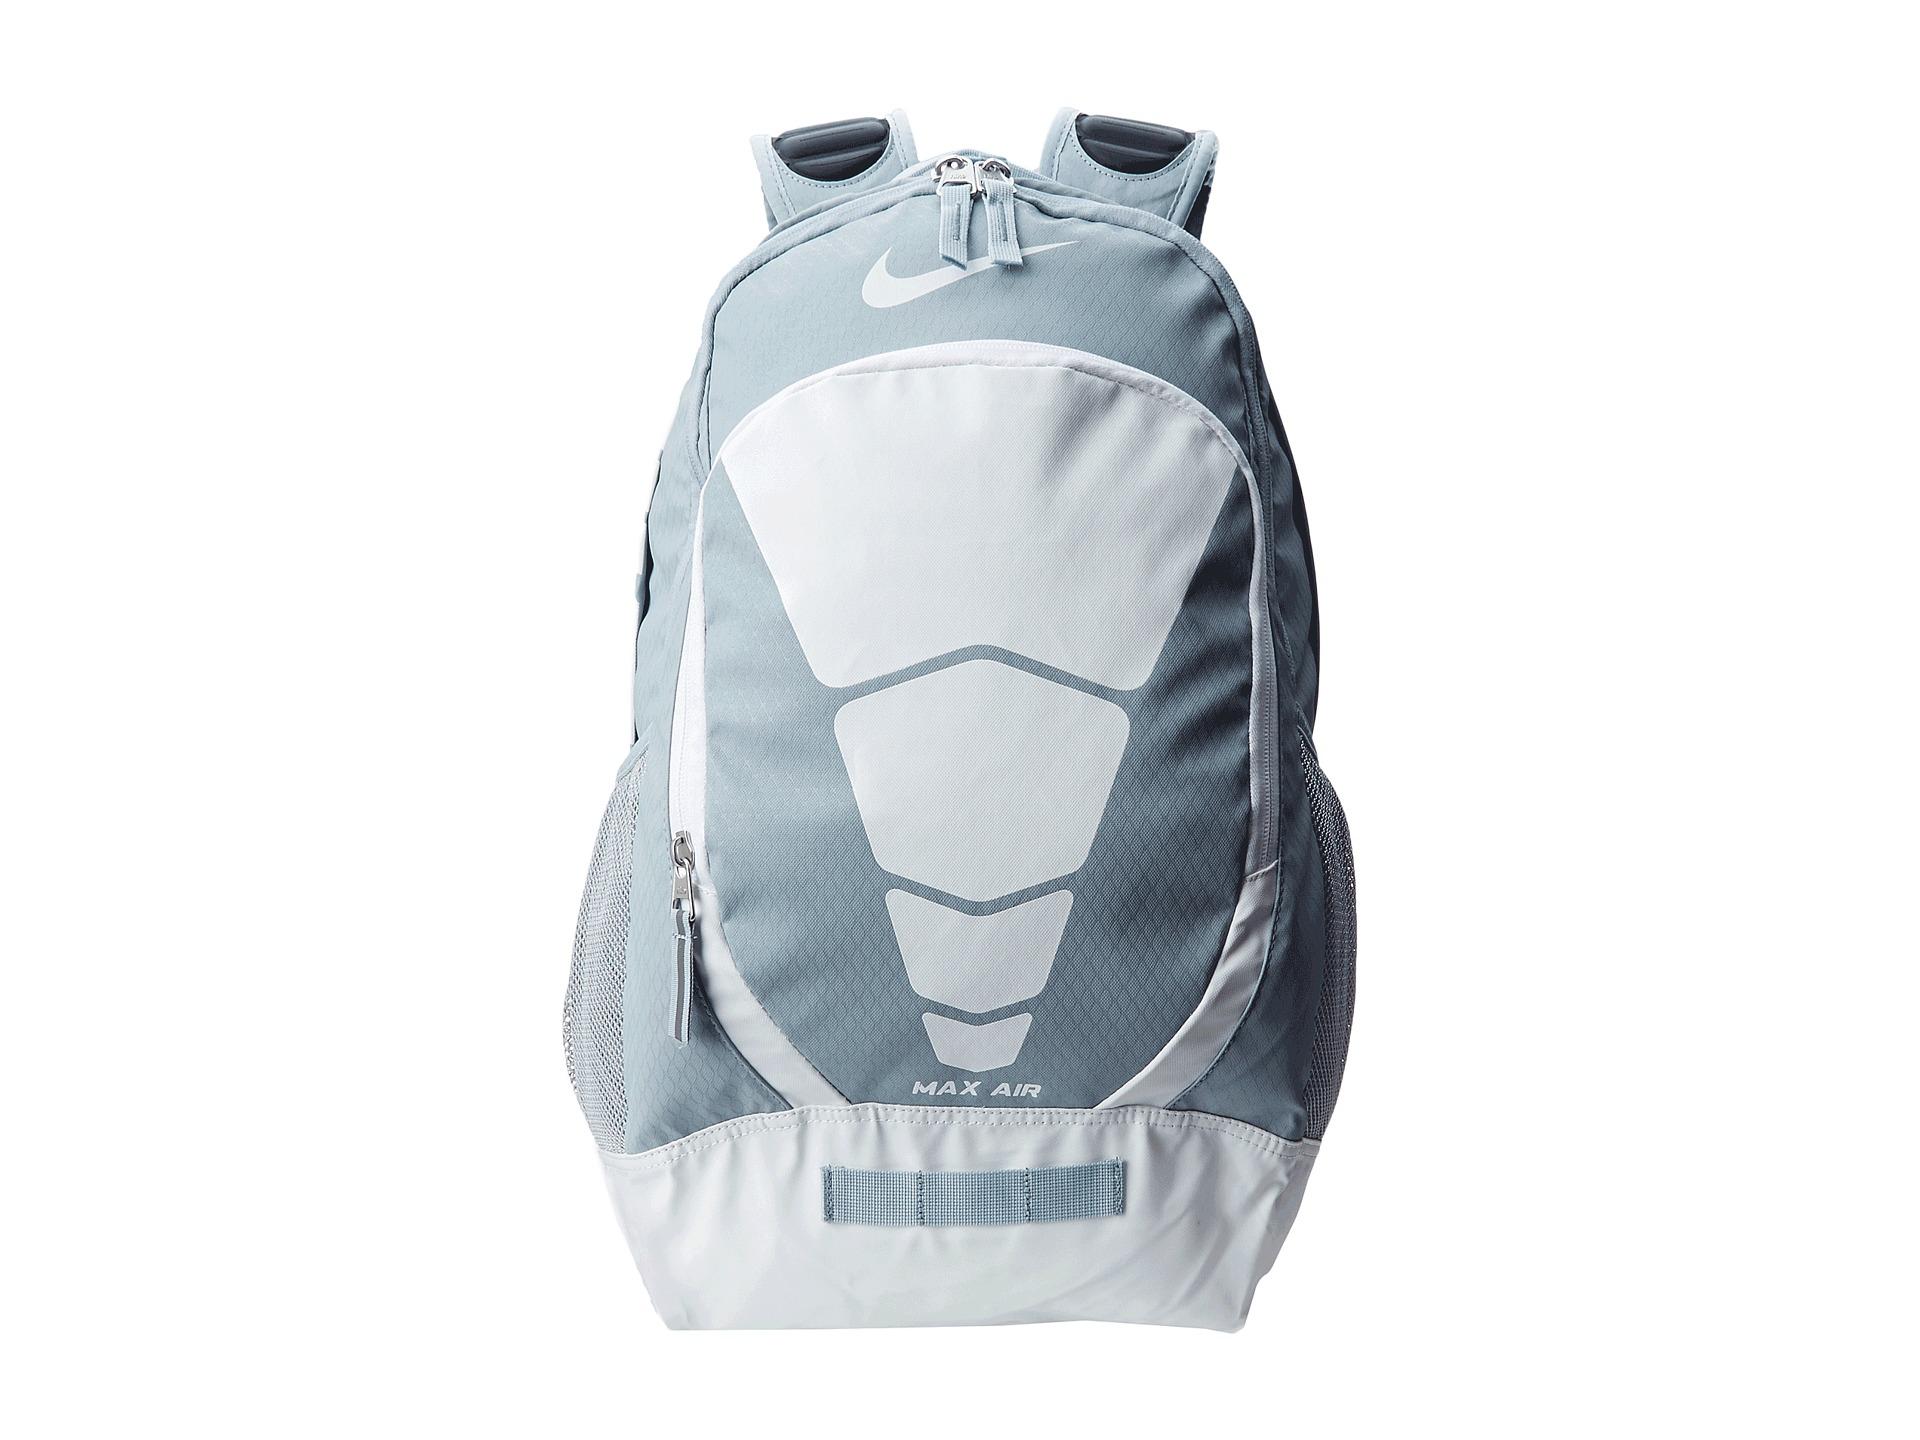 Lyst - Nike Max Air Vapor Backpack in Gray 6246df996